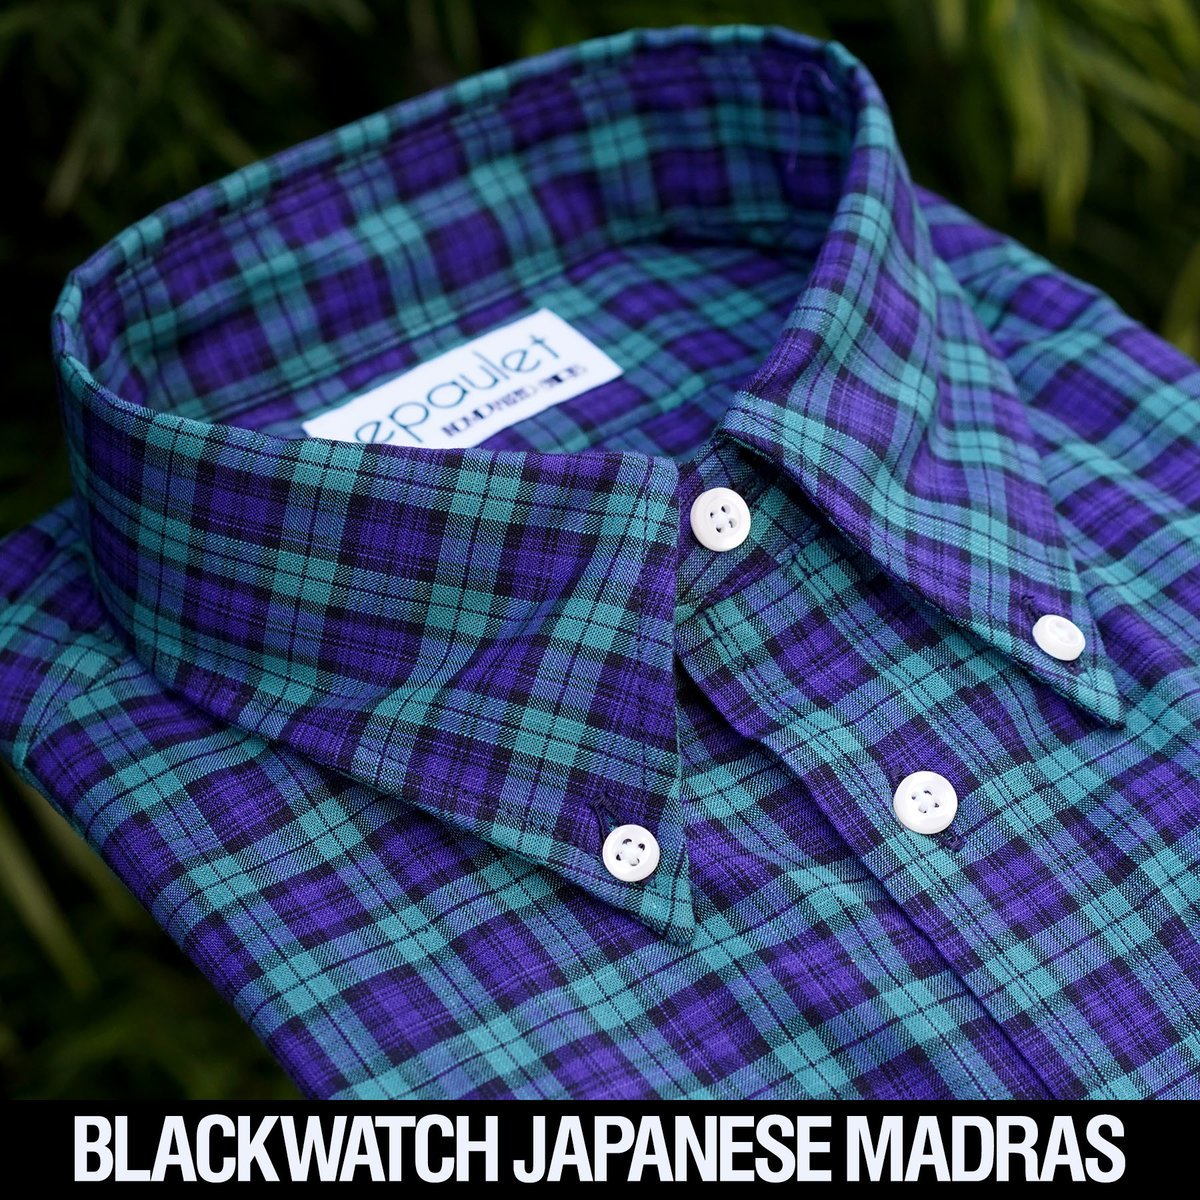 Blackwatch Japanese Madras.jpg